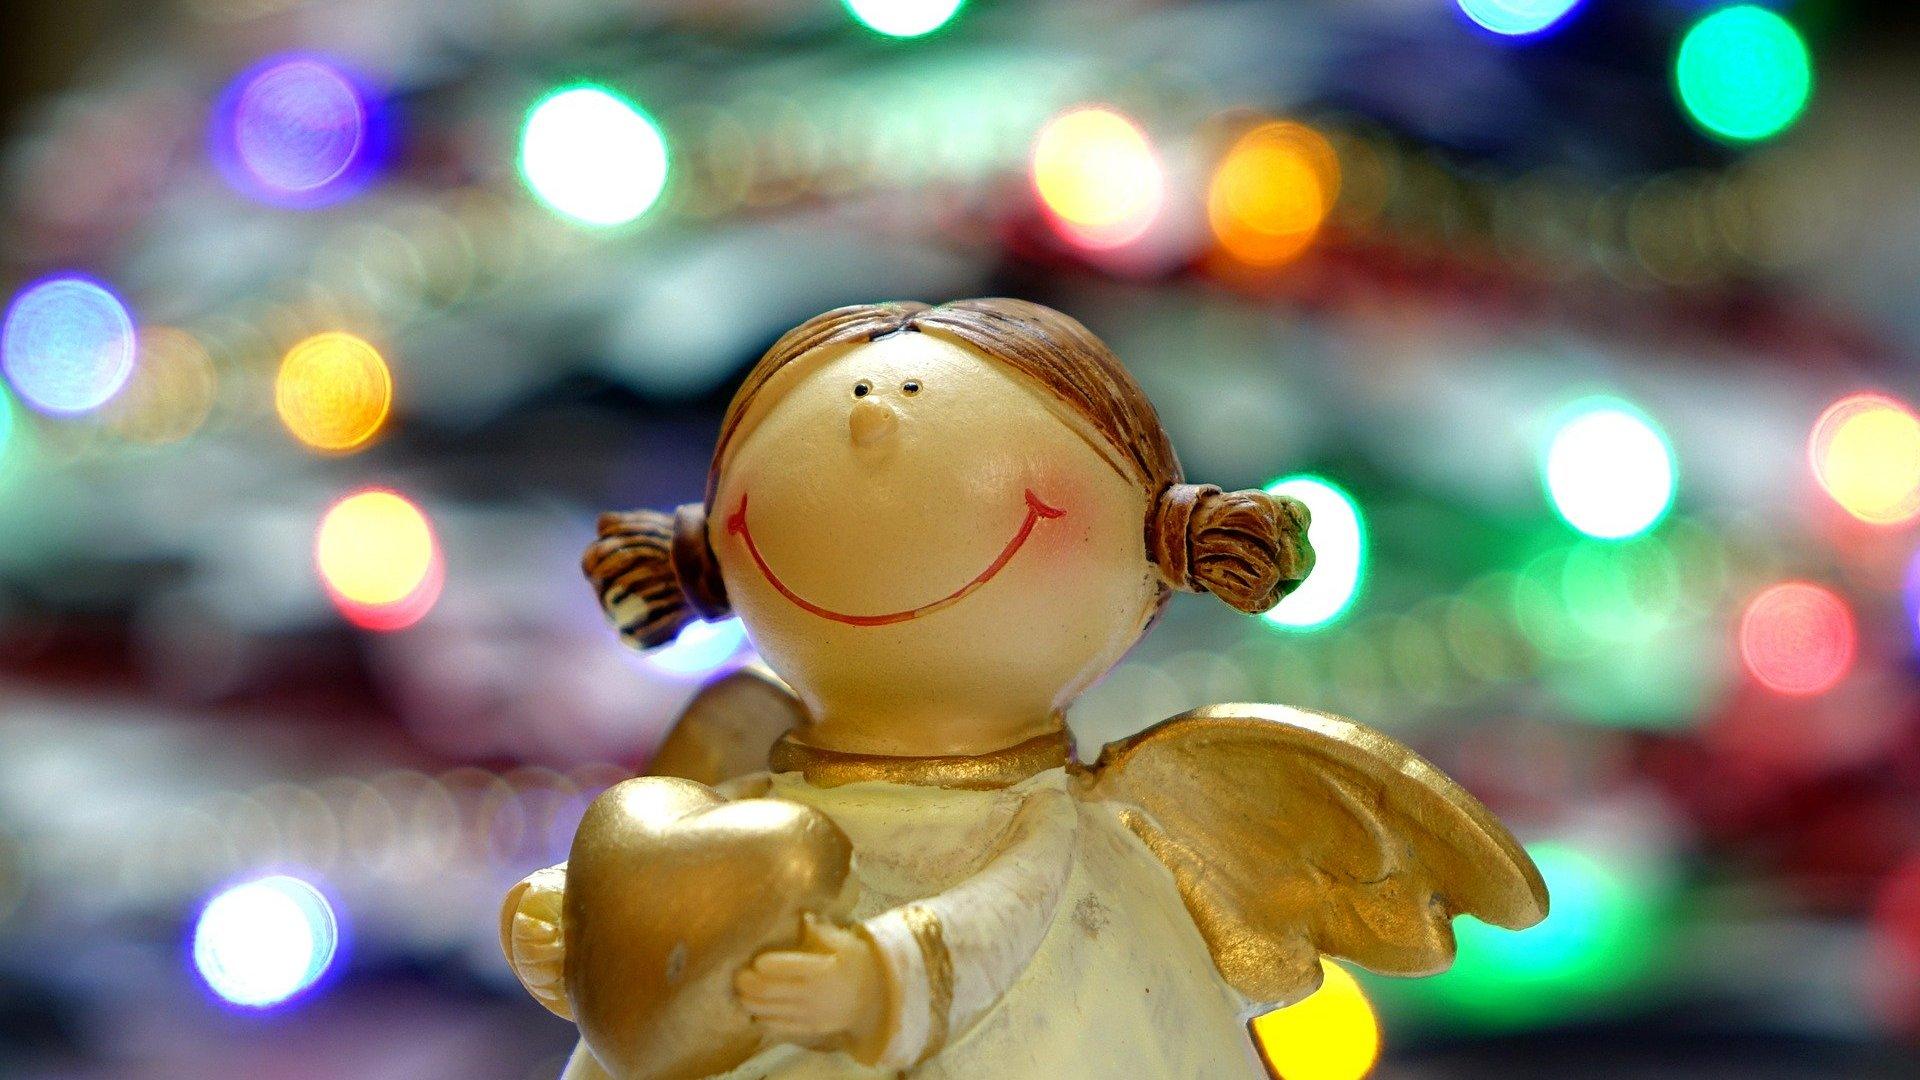 4. December - Stressjulekalenderen